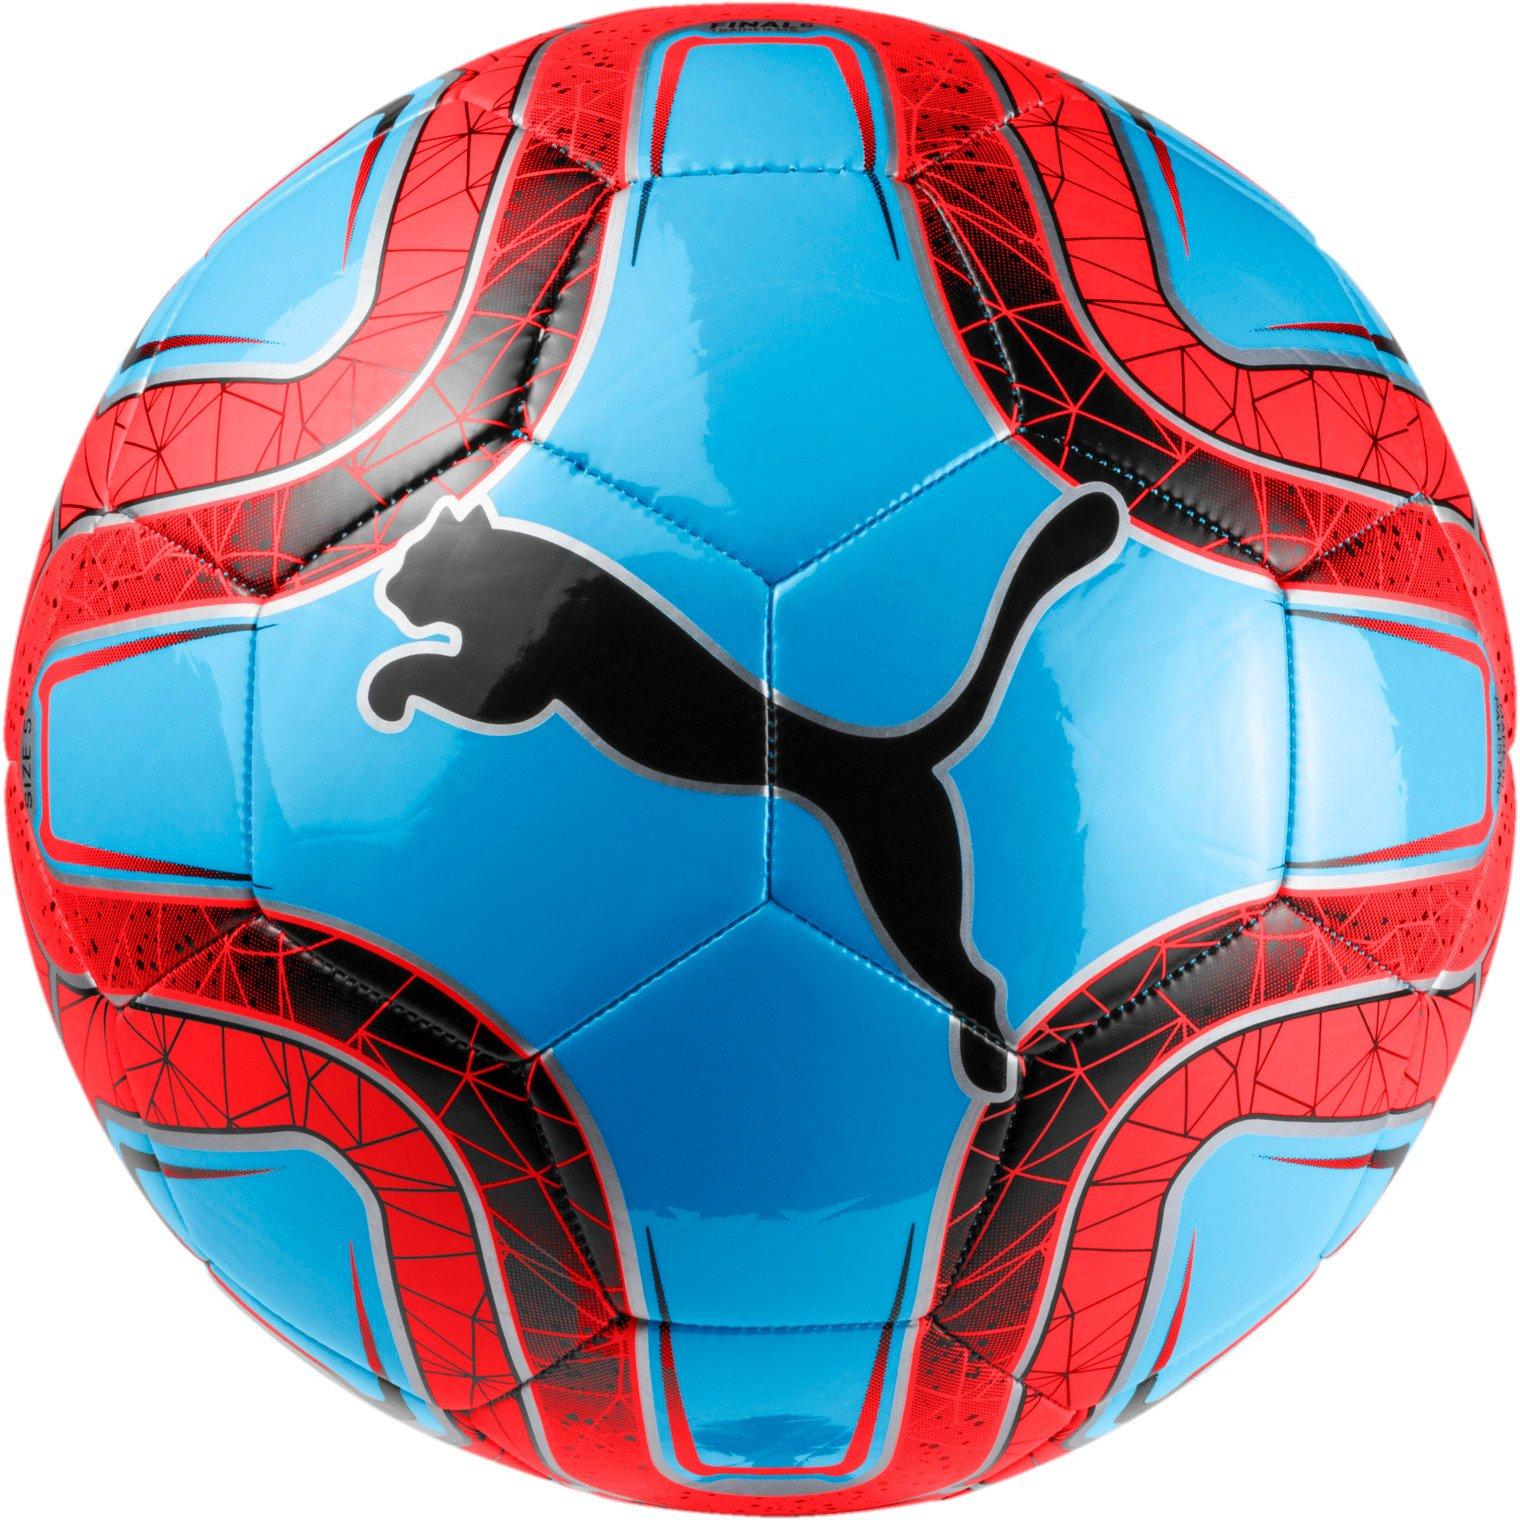 Fotbalový míč Puma Final 6 MS Trainer